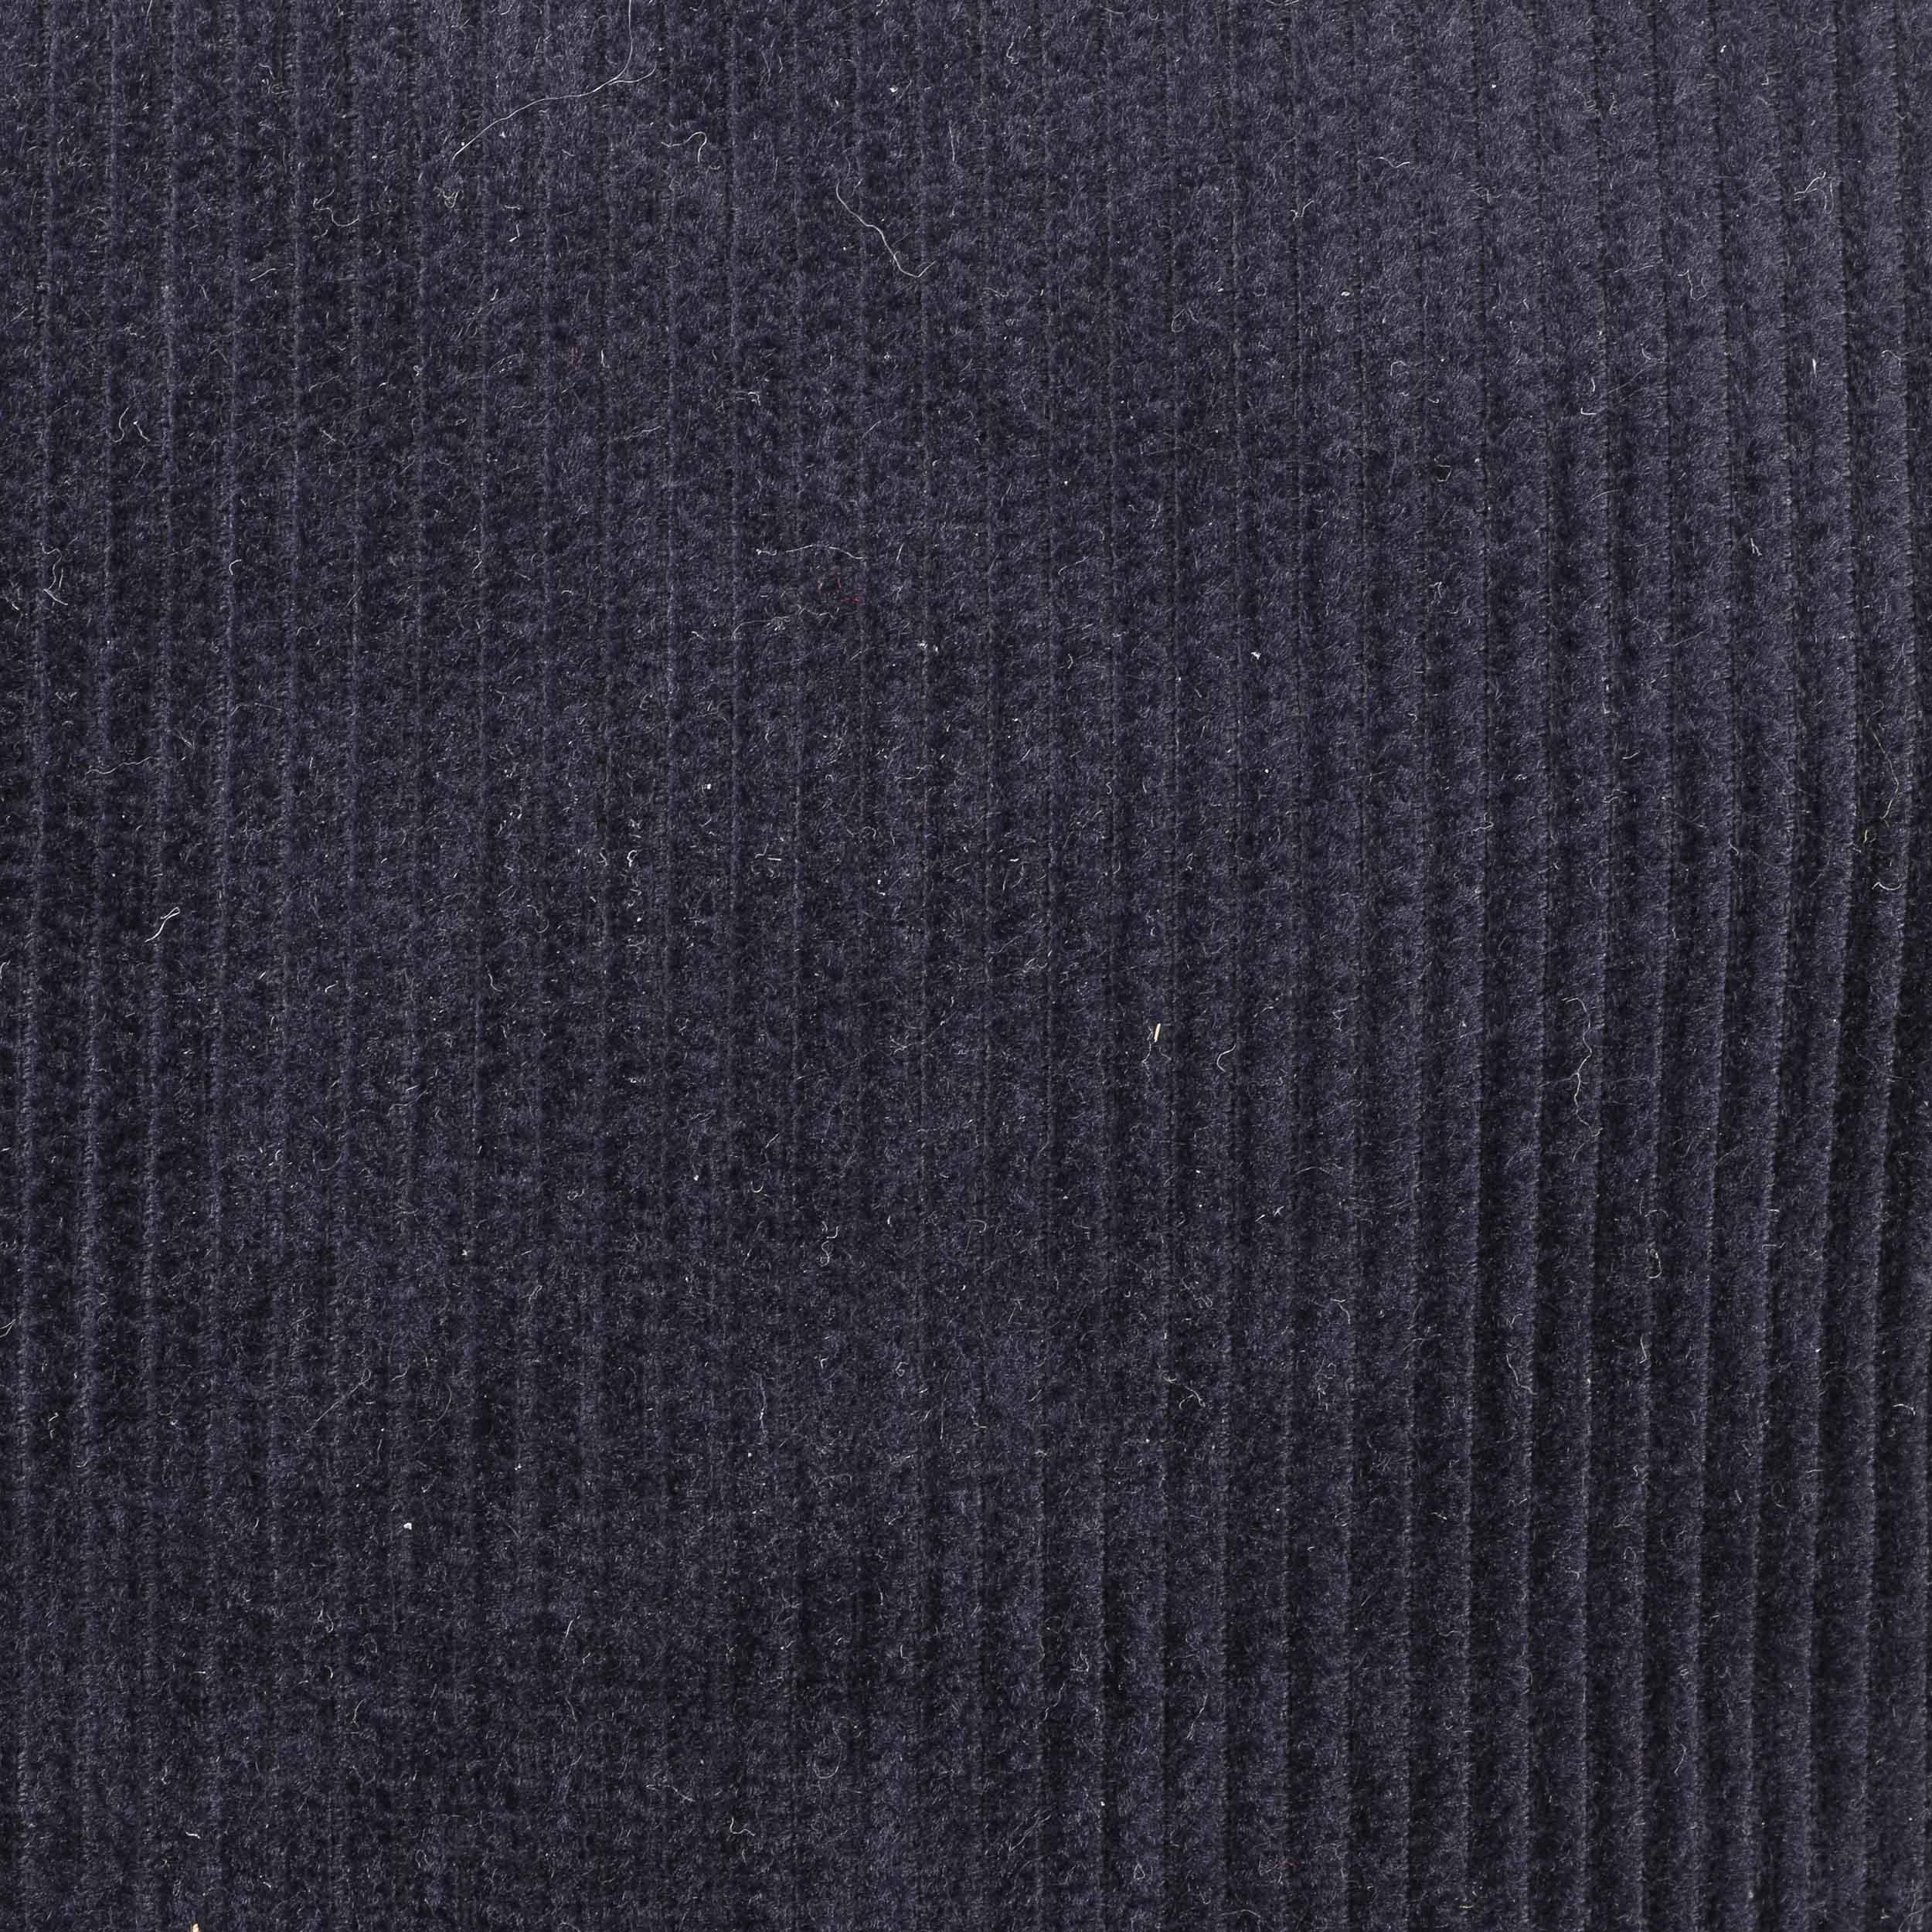 ... Coppola da Bambino Cordial by Lipodo - blu 4 ... 72c8c52551ef